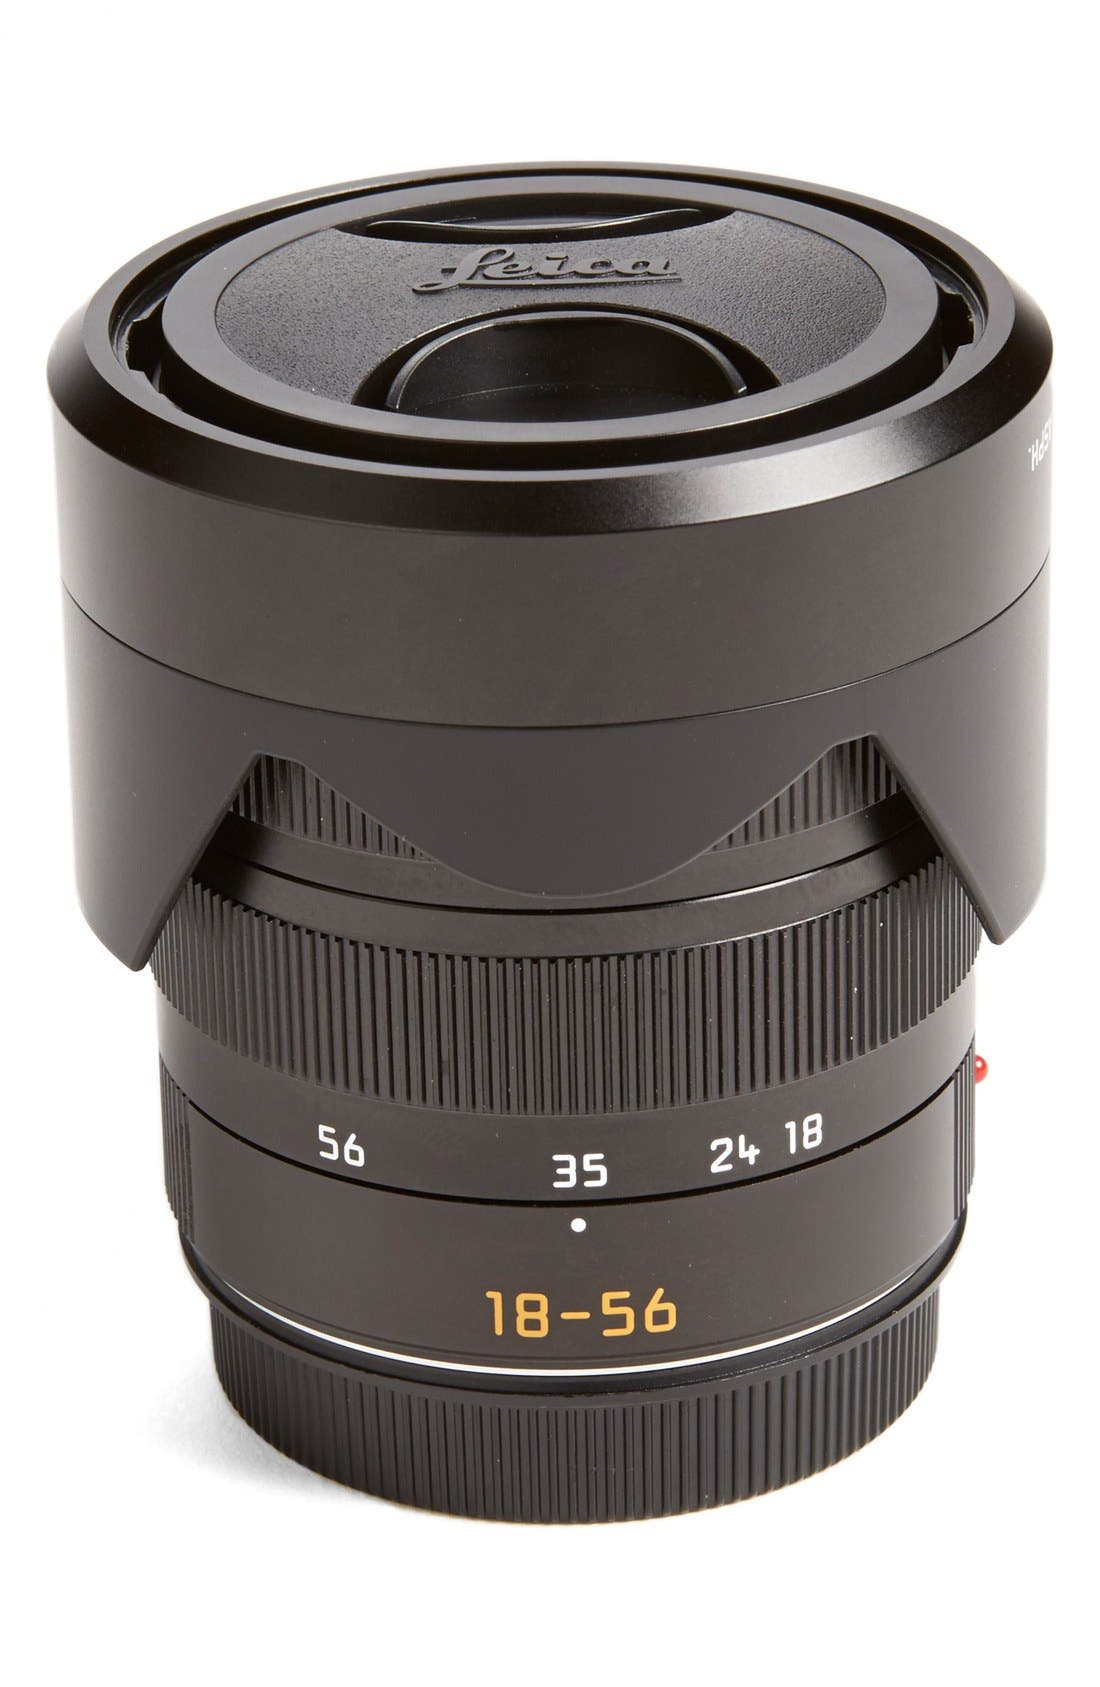 Main Image - Leica'Vario-Elmar-T' 18-56mm f / 3.5 - 5.6 ASPHLens